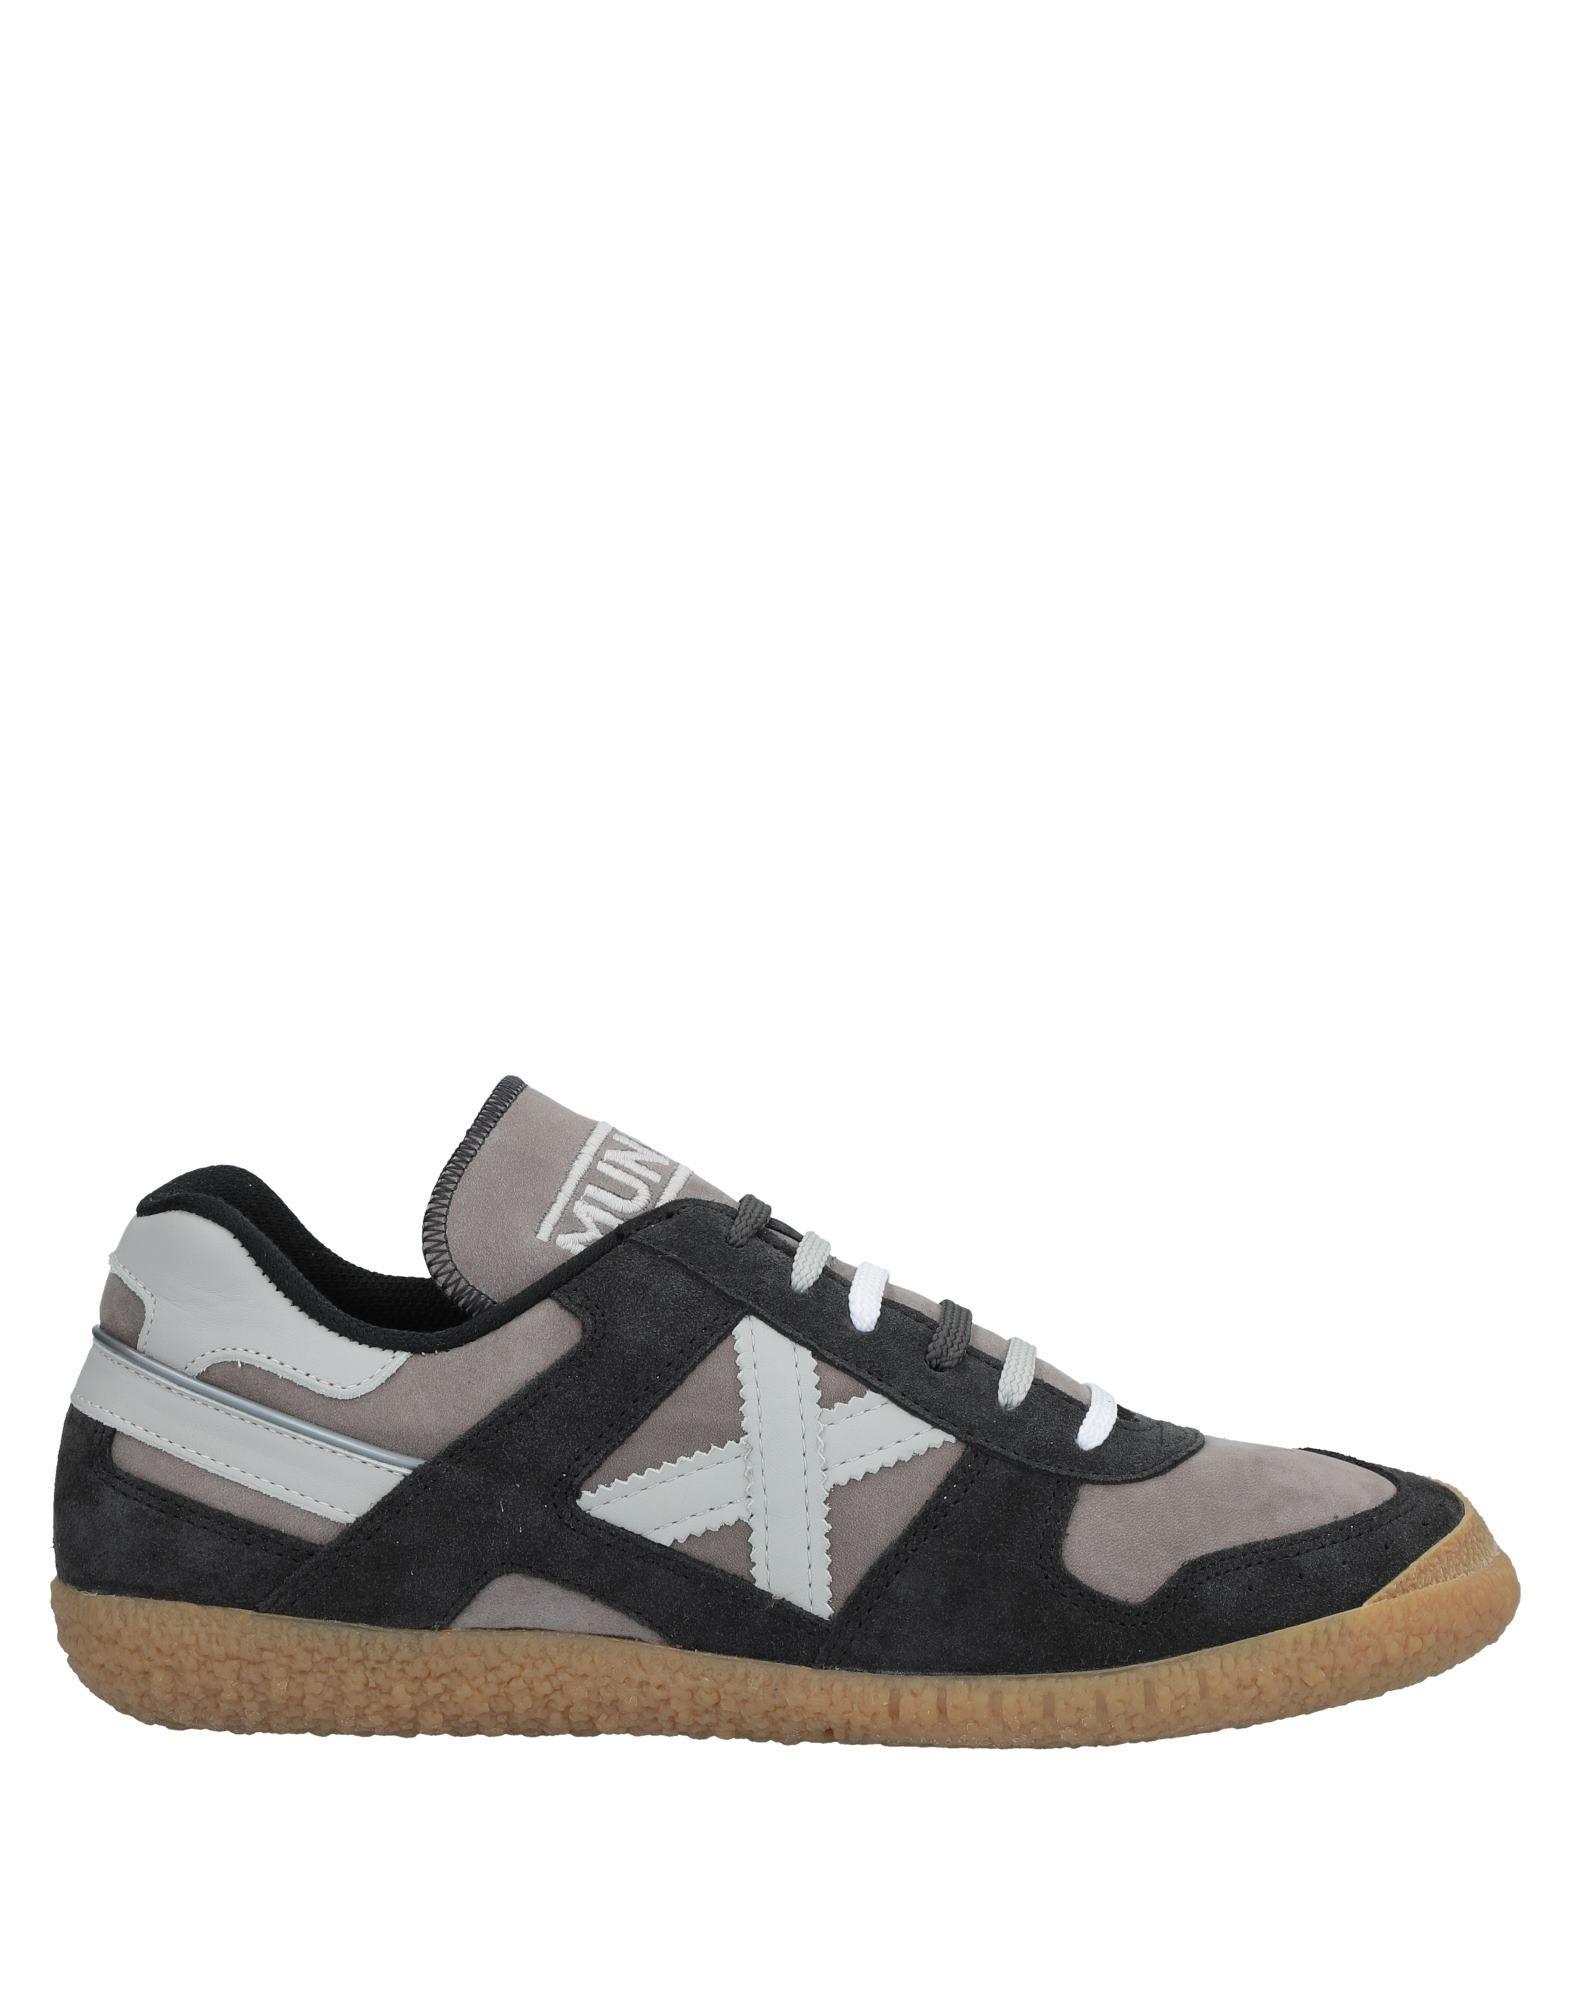 Moda Sneakers Munich Uomo - 11536898TK